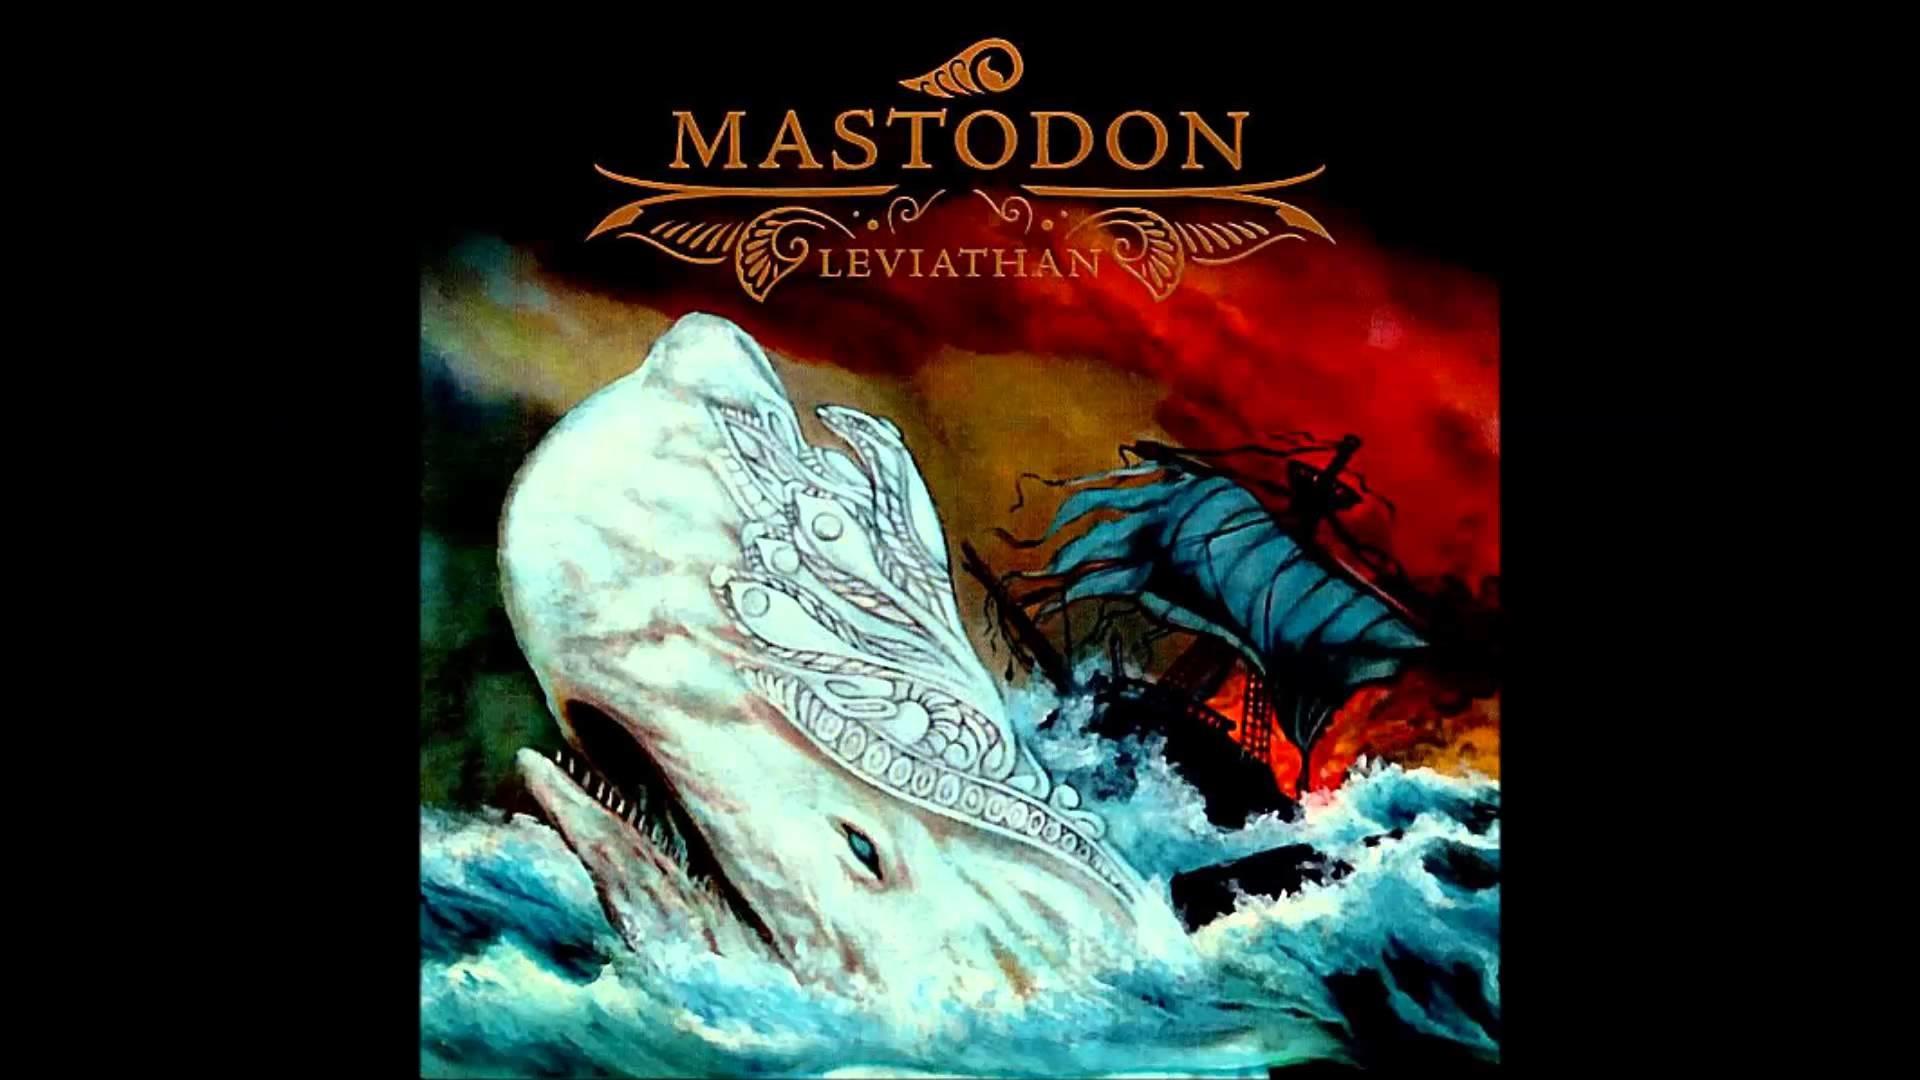 … leviathan mastodon wallpaper …